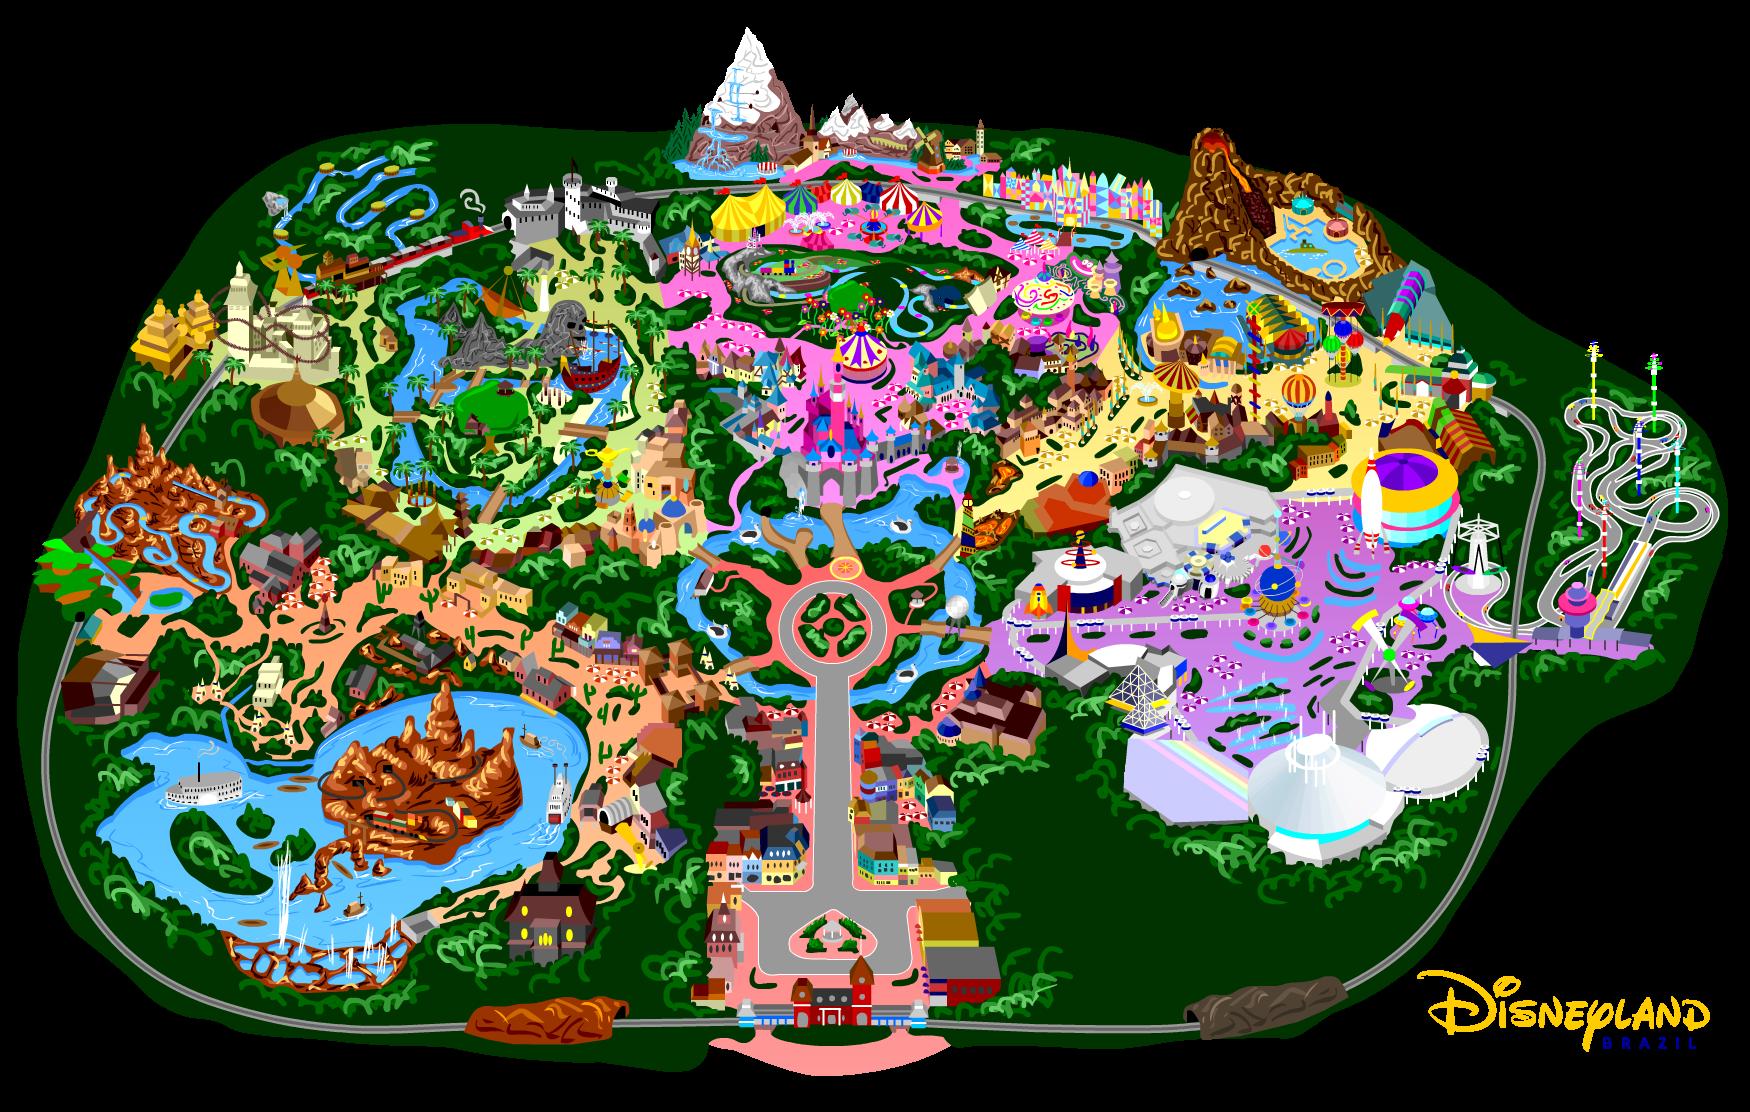 Disneyland 7.0 by mrzahta on DeviantArt on